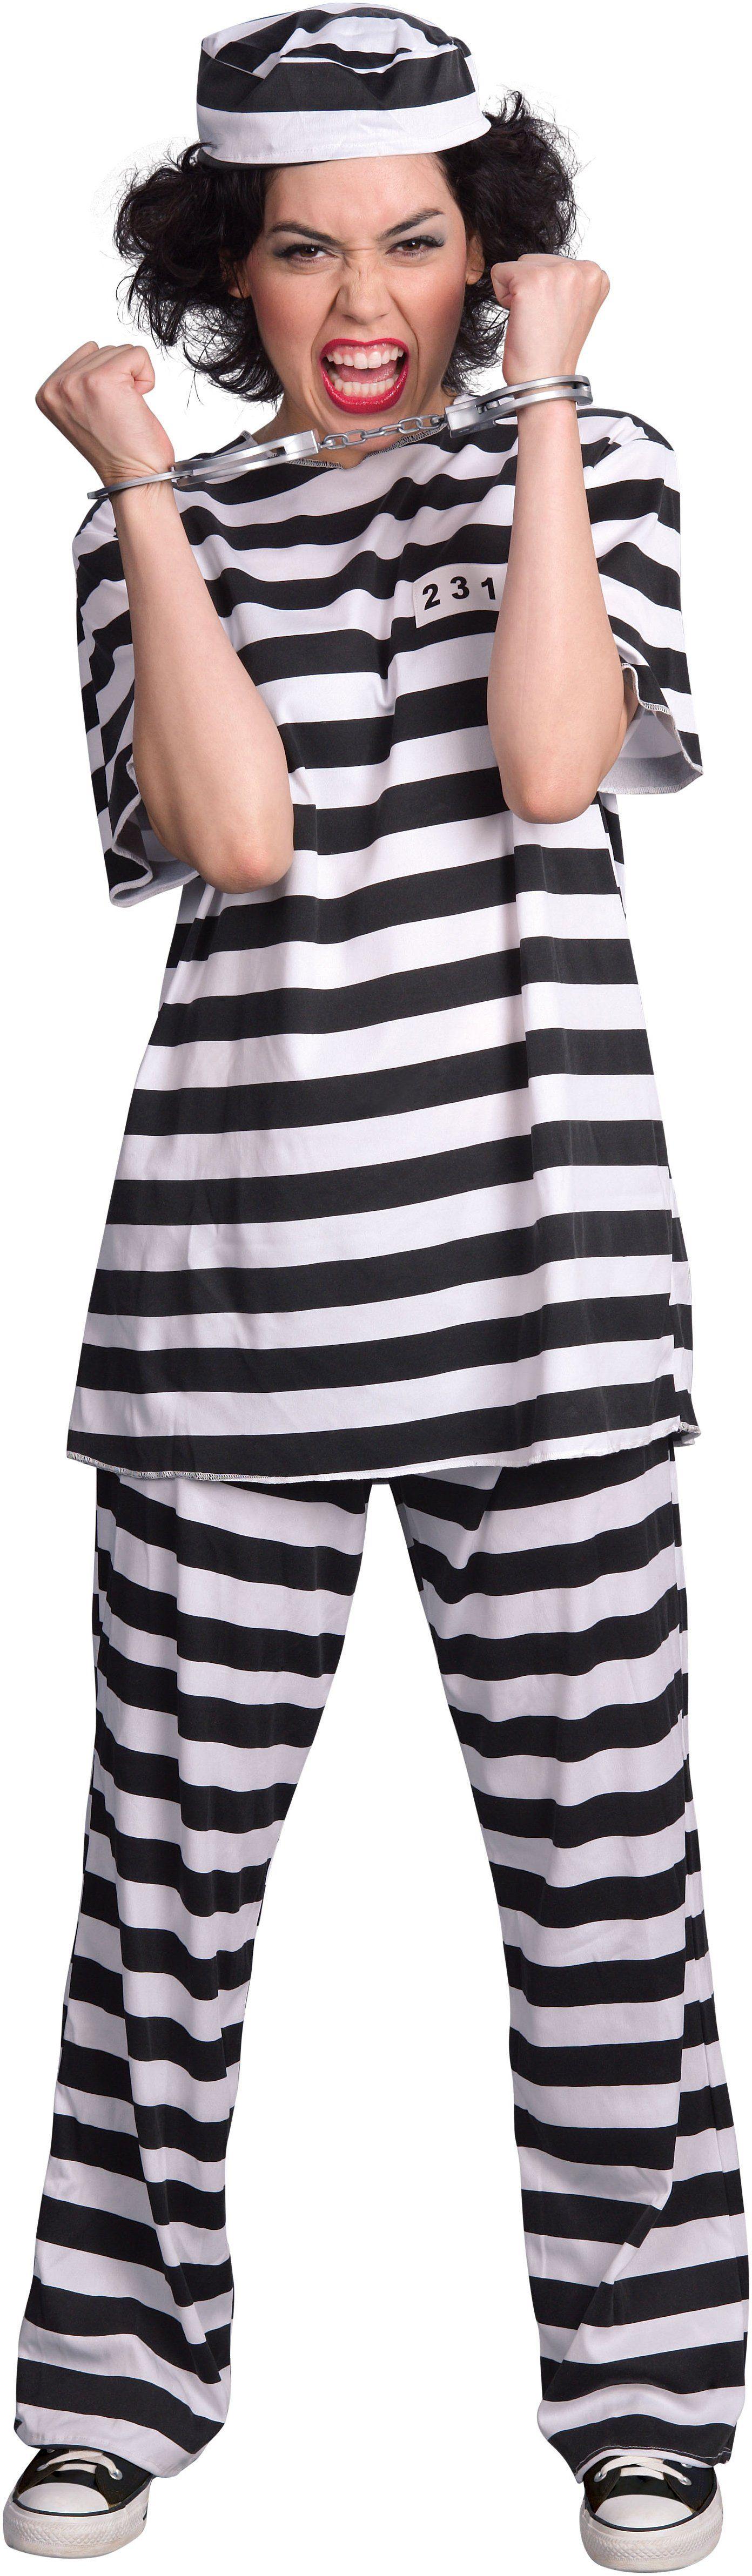 Female Prisoner Adult Costume  sc 1 st  Pinterest & Female Prisoner Adult Costume from Buycostumes.com | Costumes ...